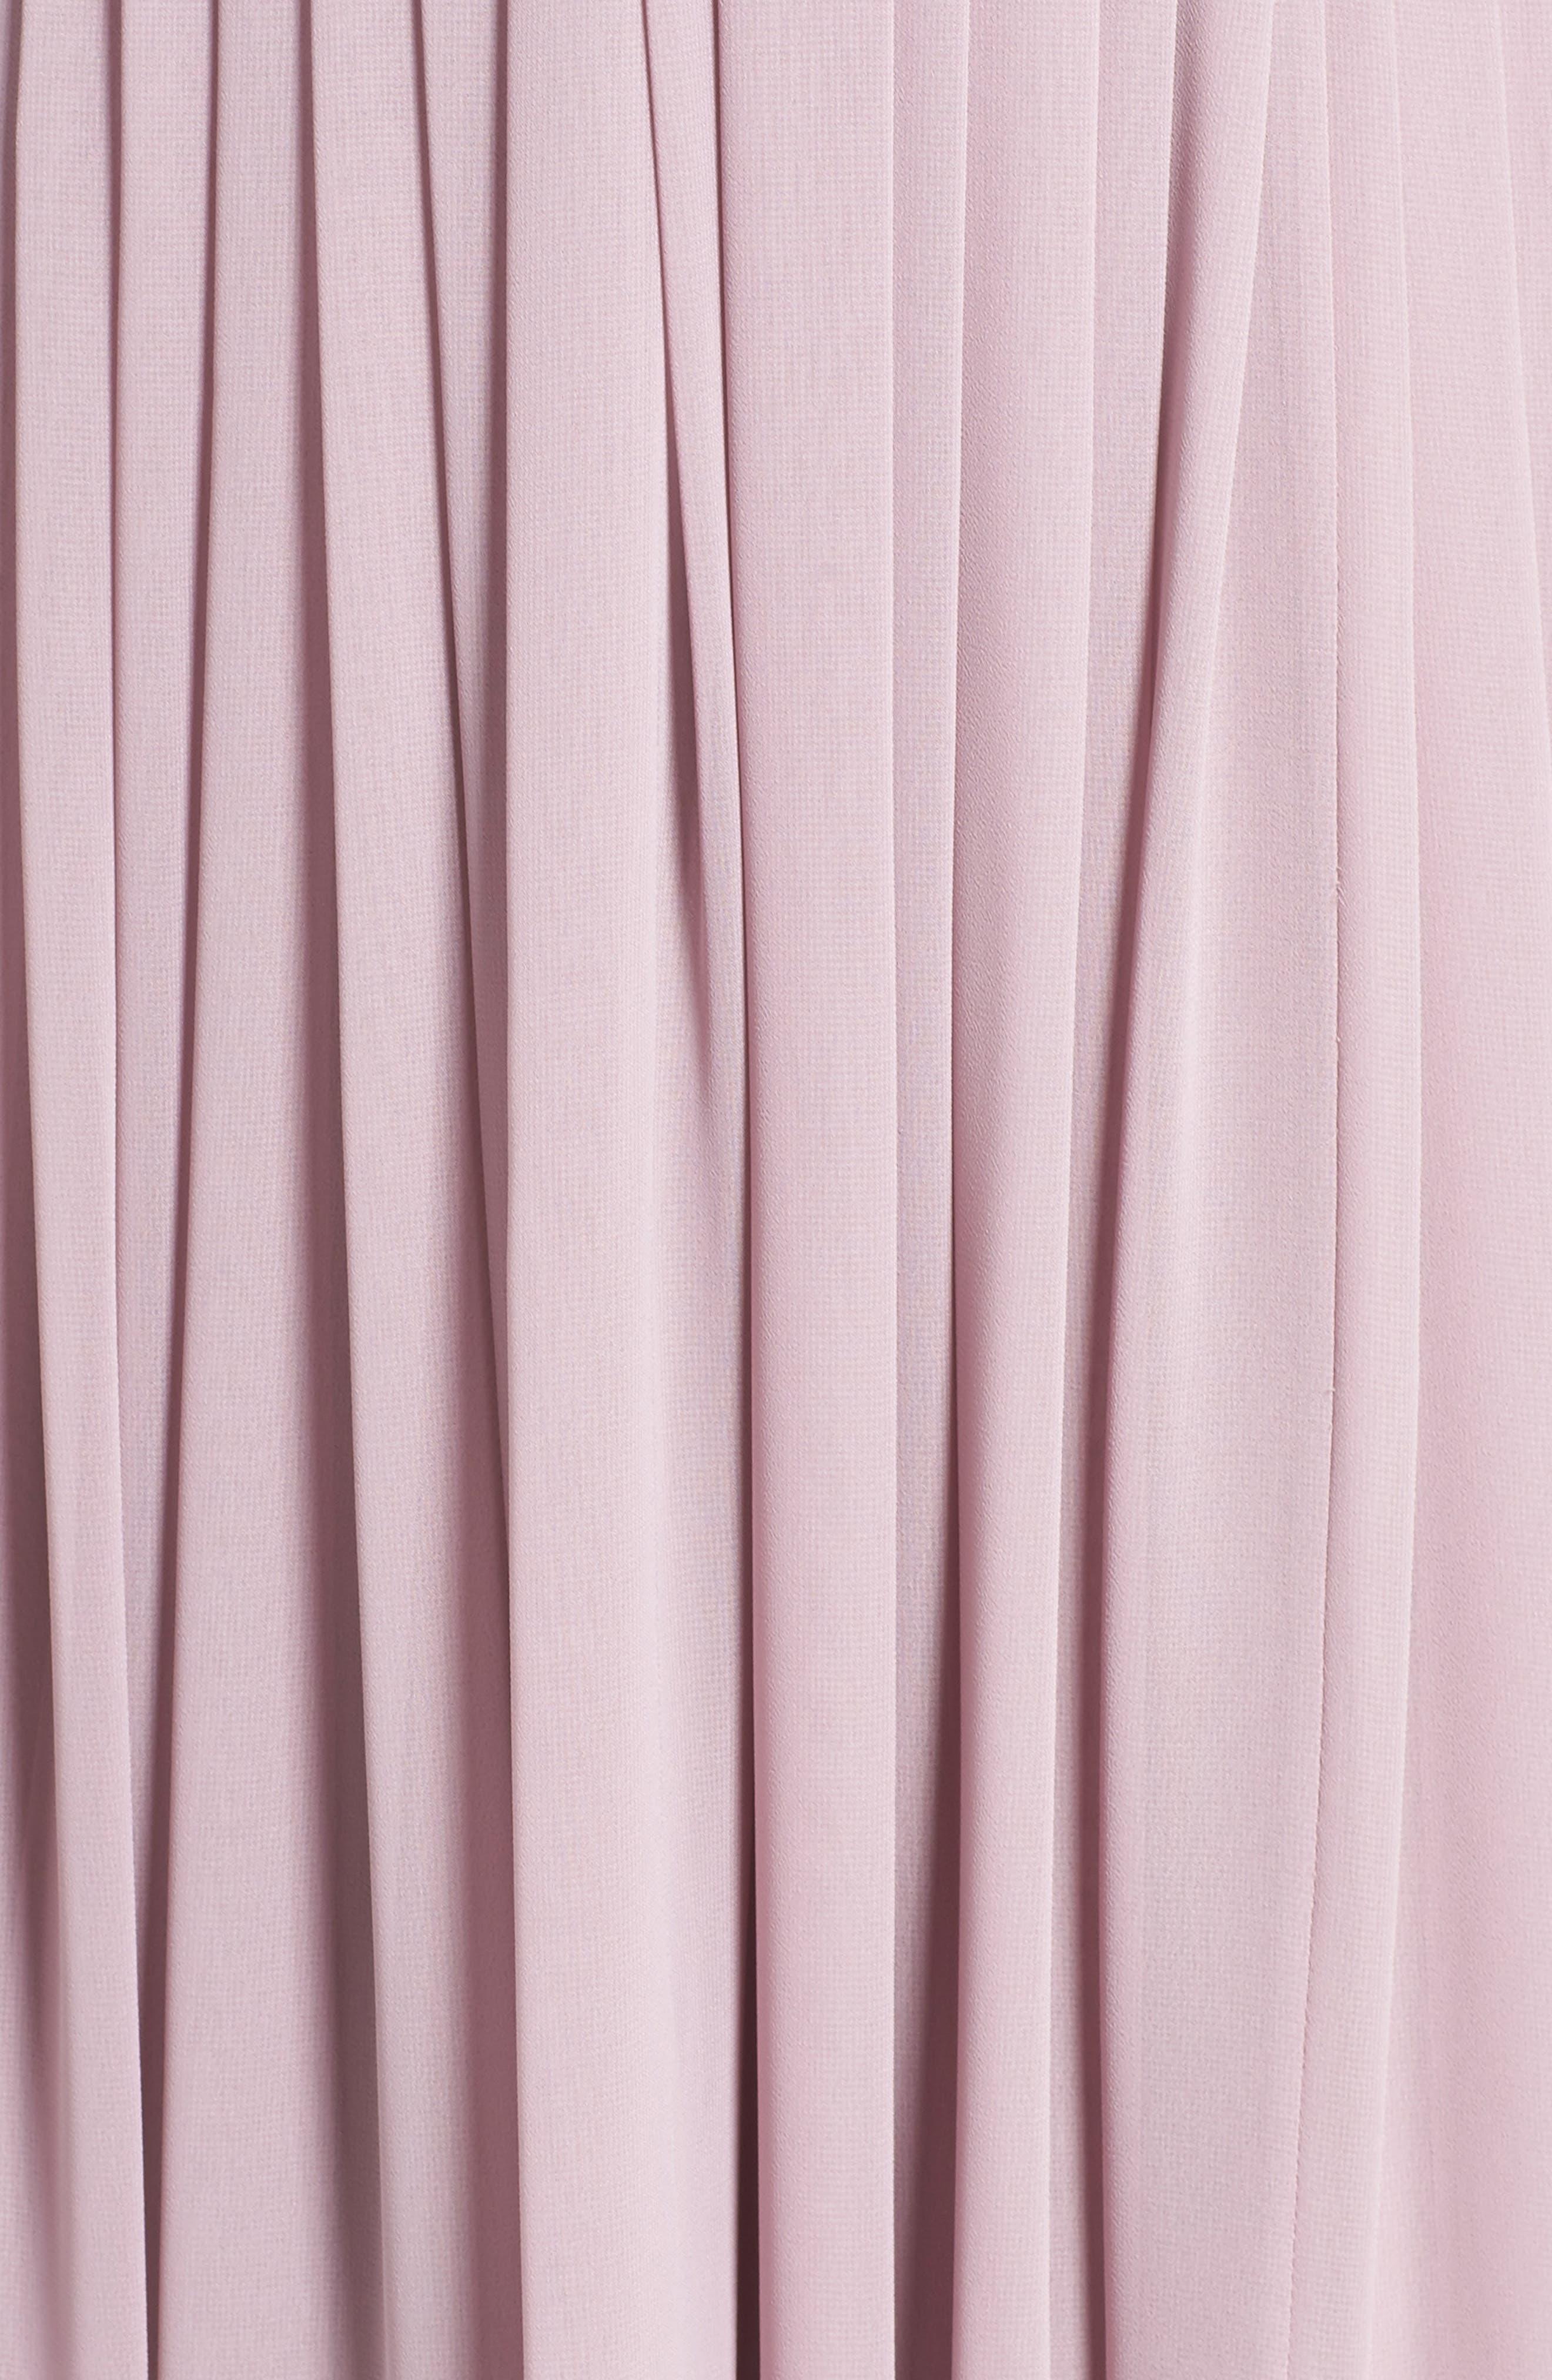 Deep V-Neck Ruffle Pleat Chiffon Gown,                             Alternate thumbnail 28, color,